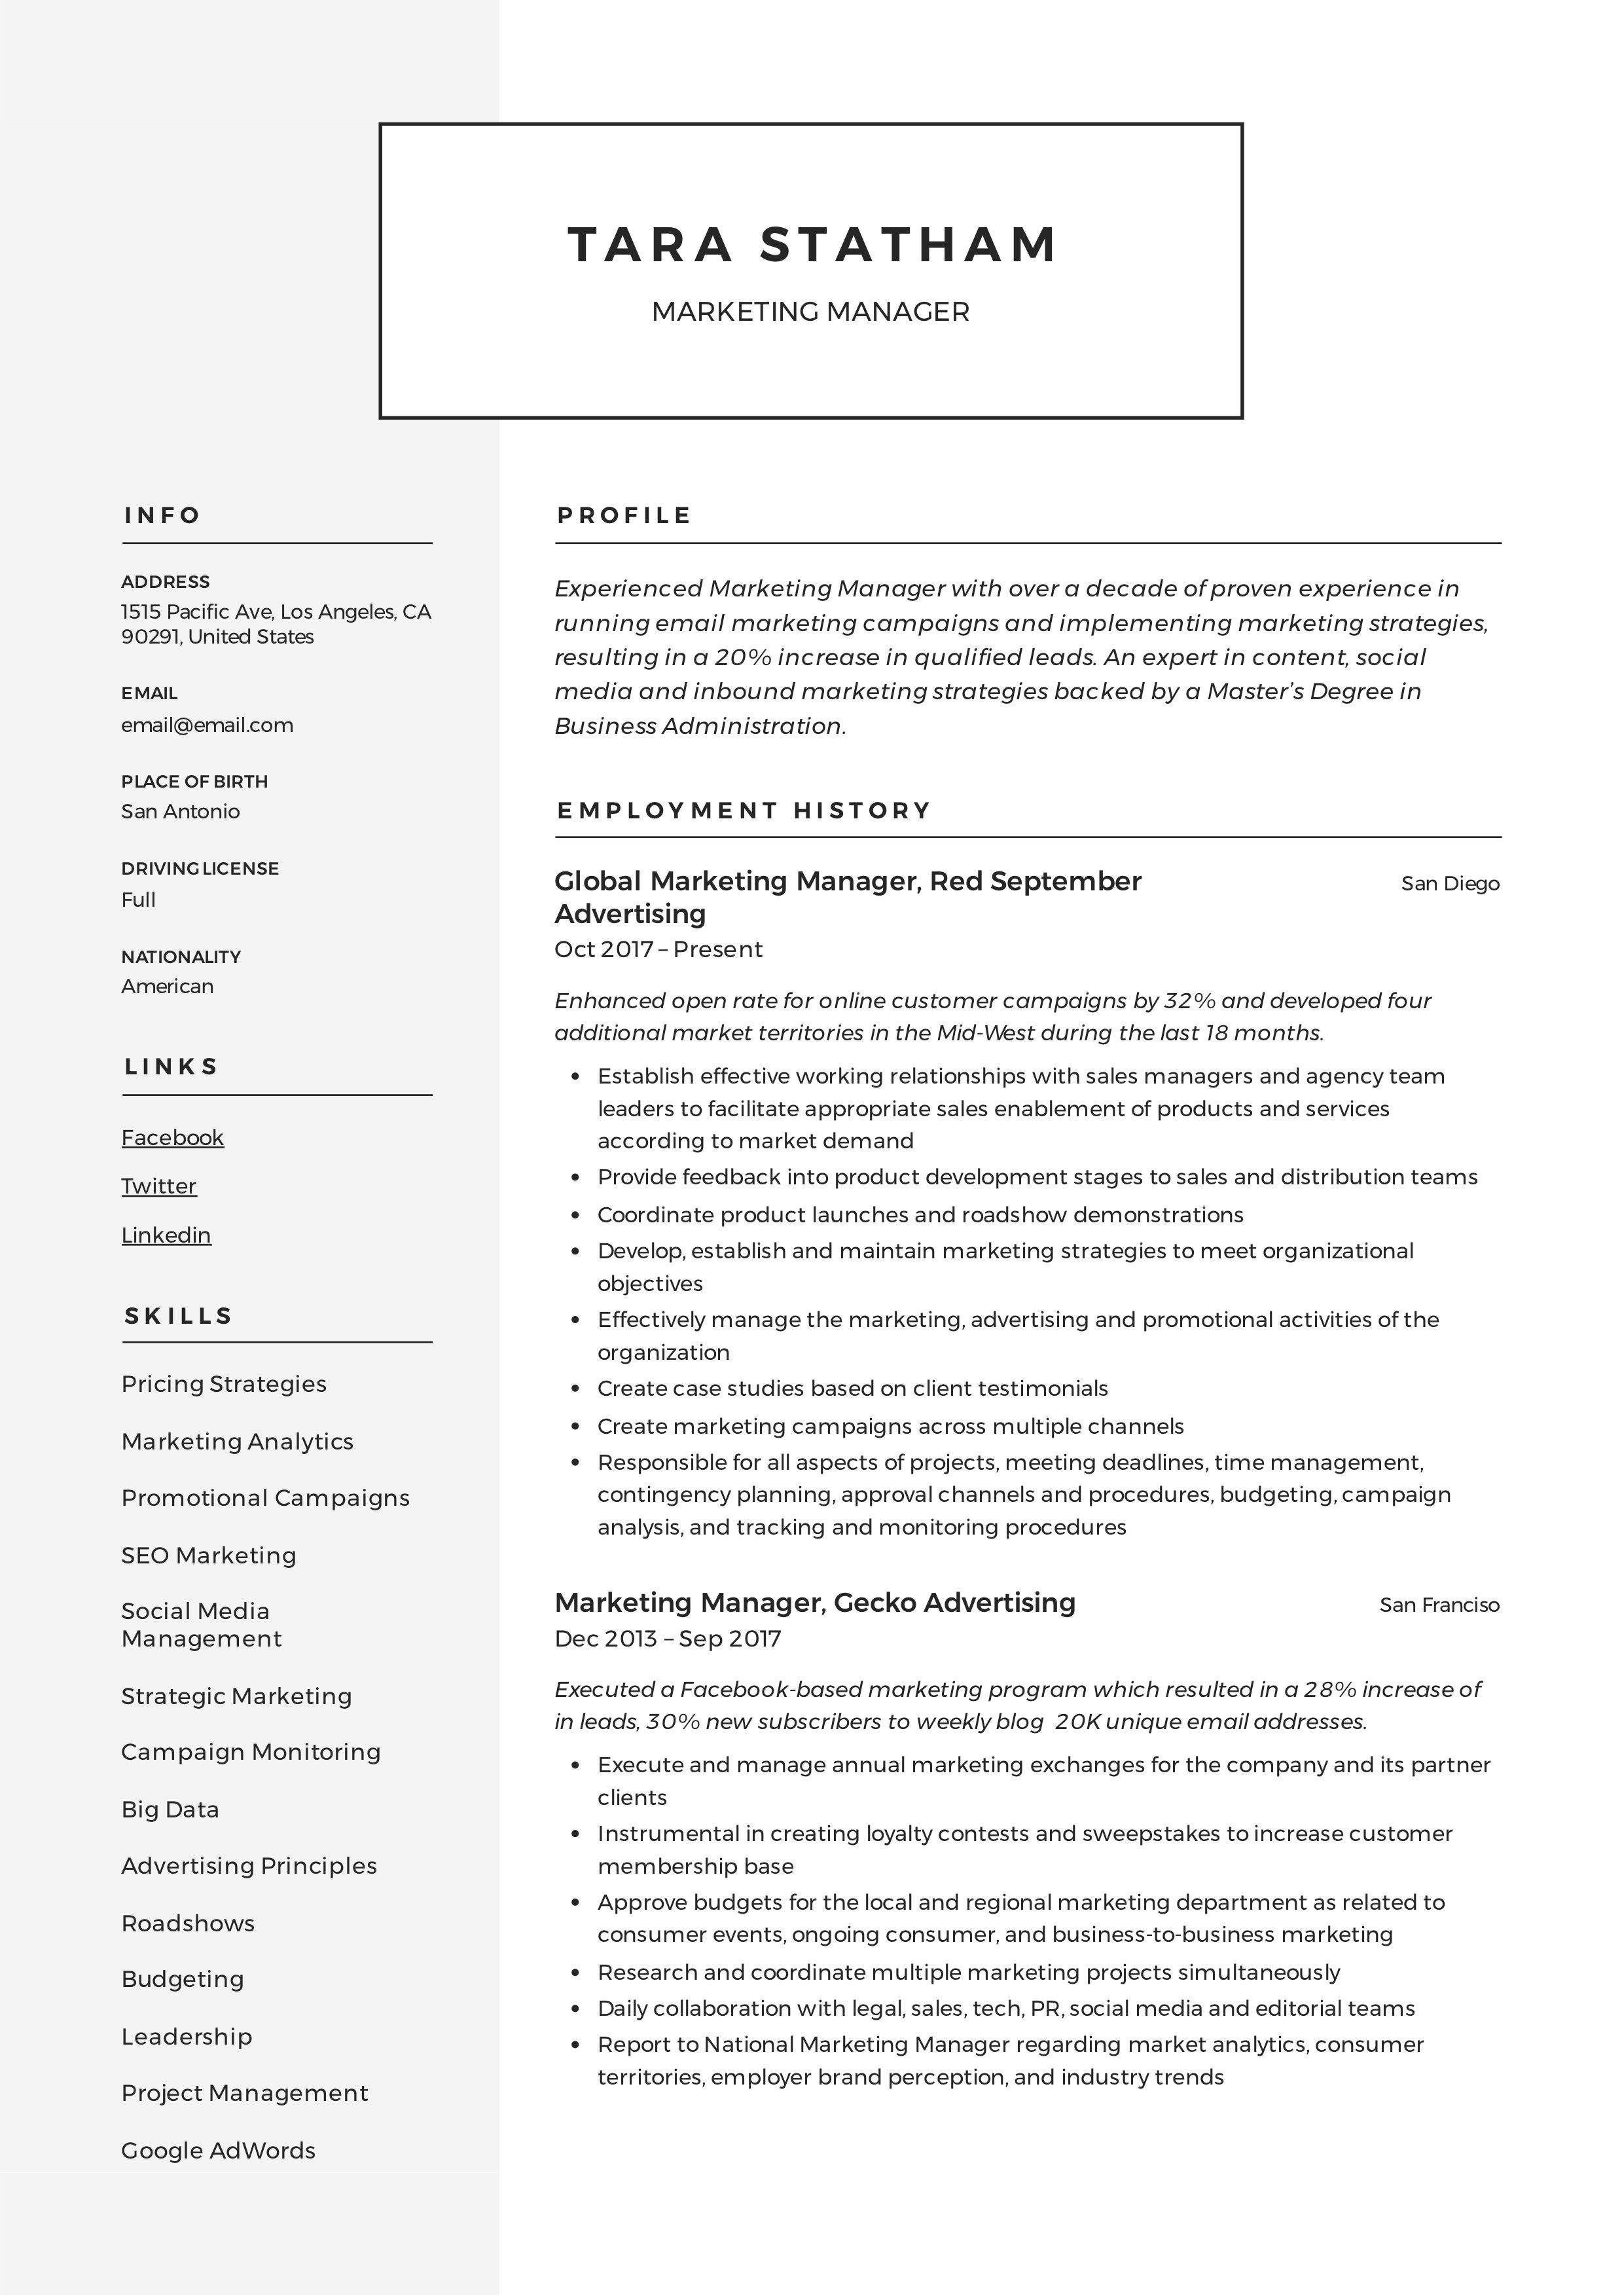 Marketing Manager Resume Writing Guide En 2020